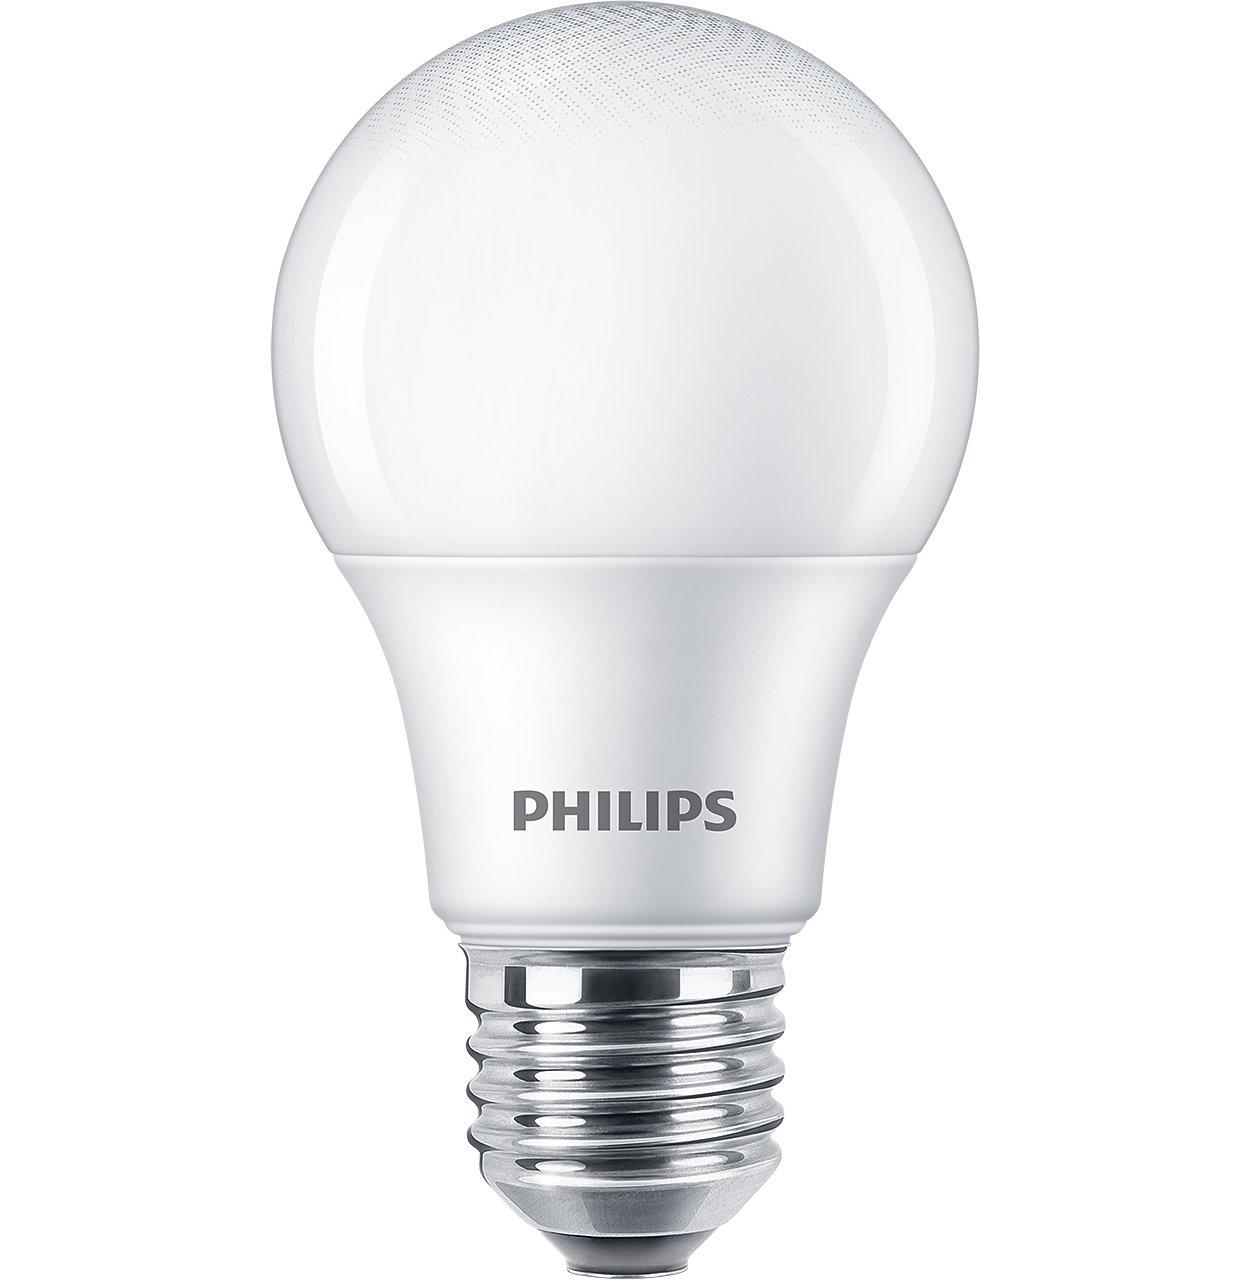 Tu lámpara LED cotidiana